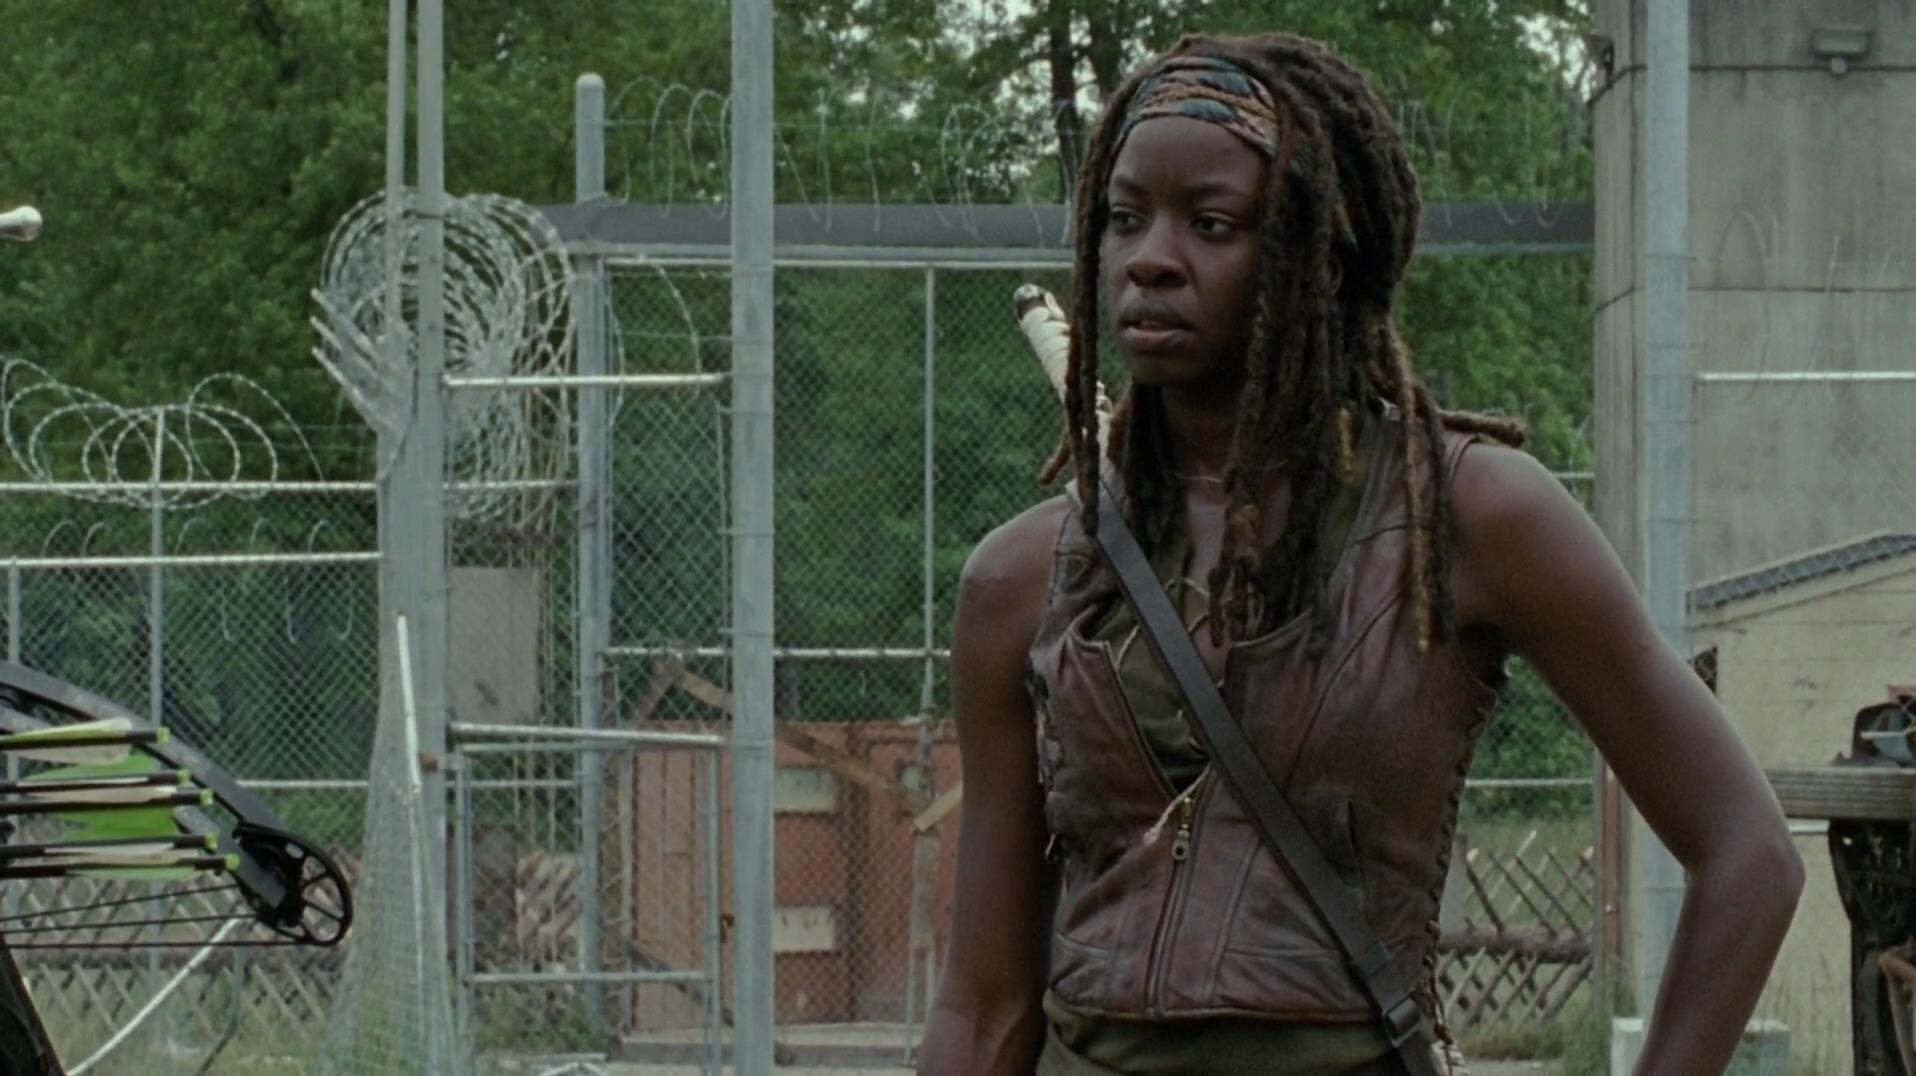 'The Walking Dead' Season 4 Episode 1 Captures